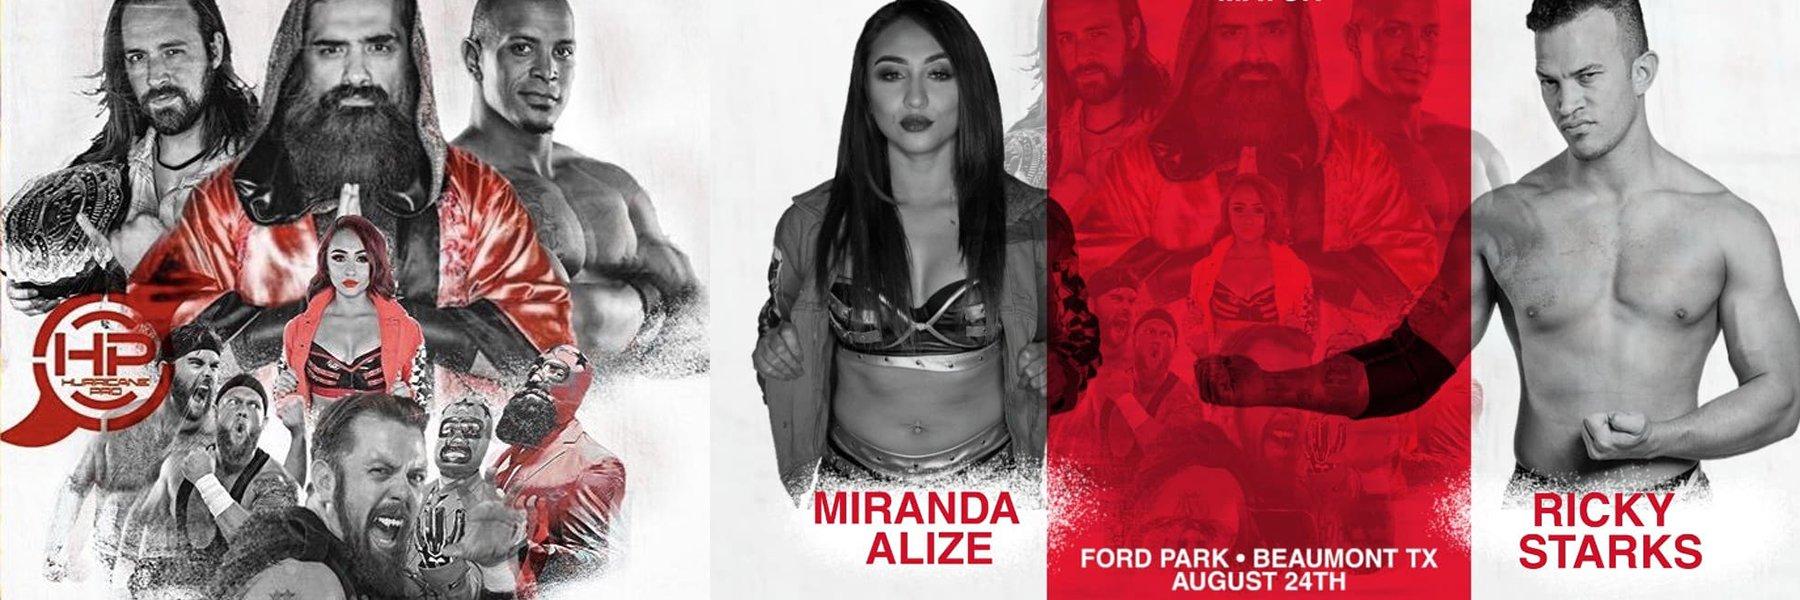 Hurricane Pro LIVE iPPV 8/24 - Miranda Alize vs Ricky Starks, Ryan Davidson